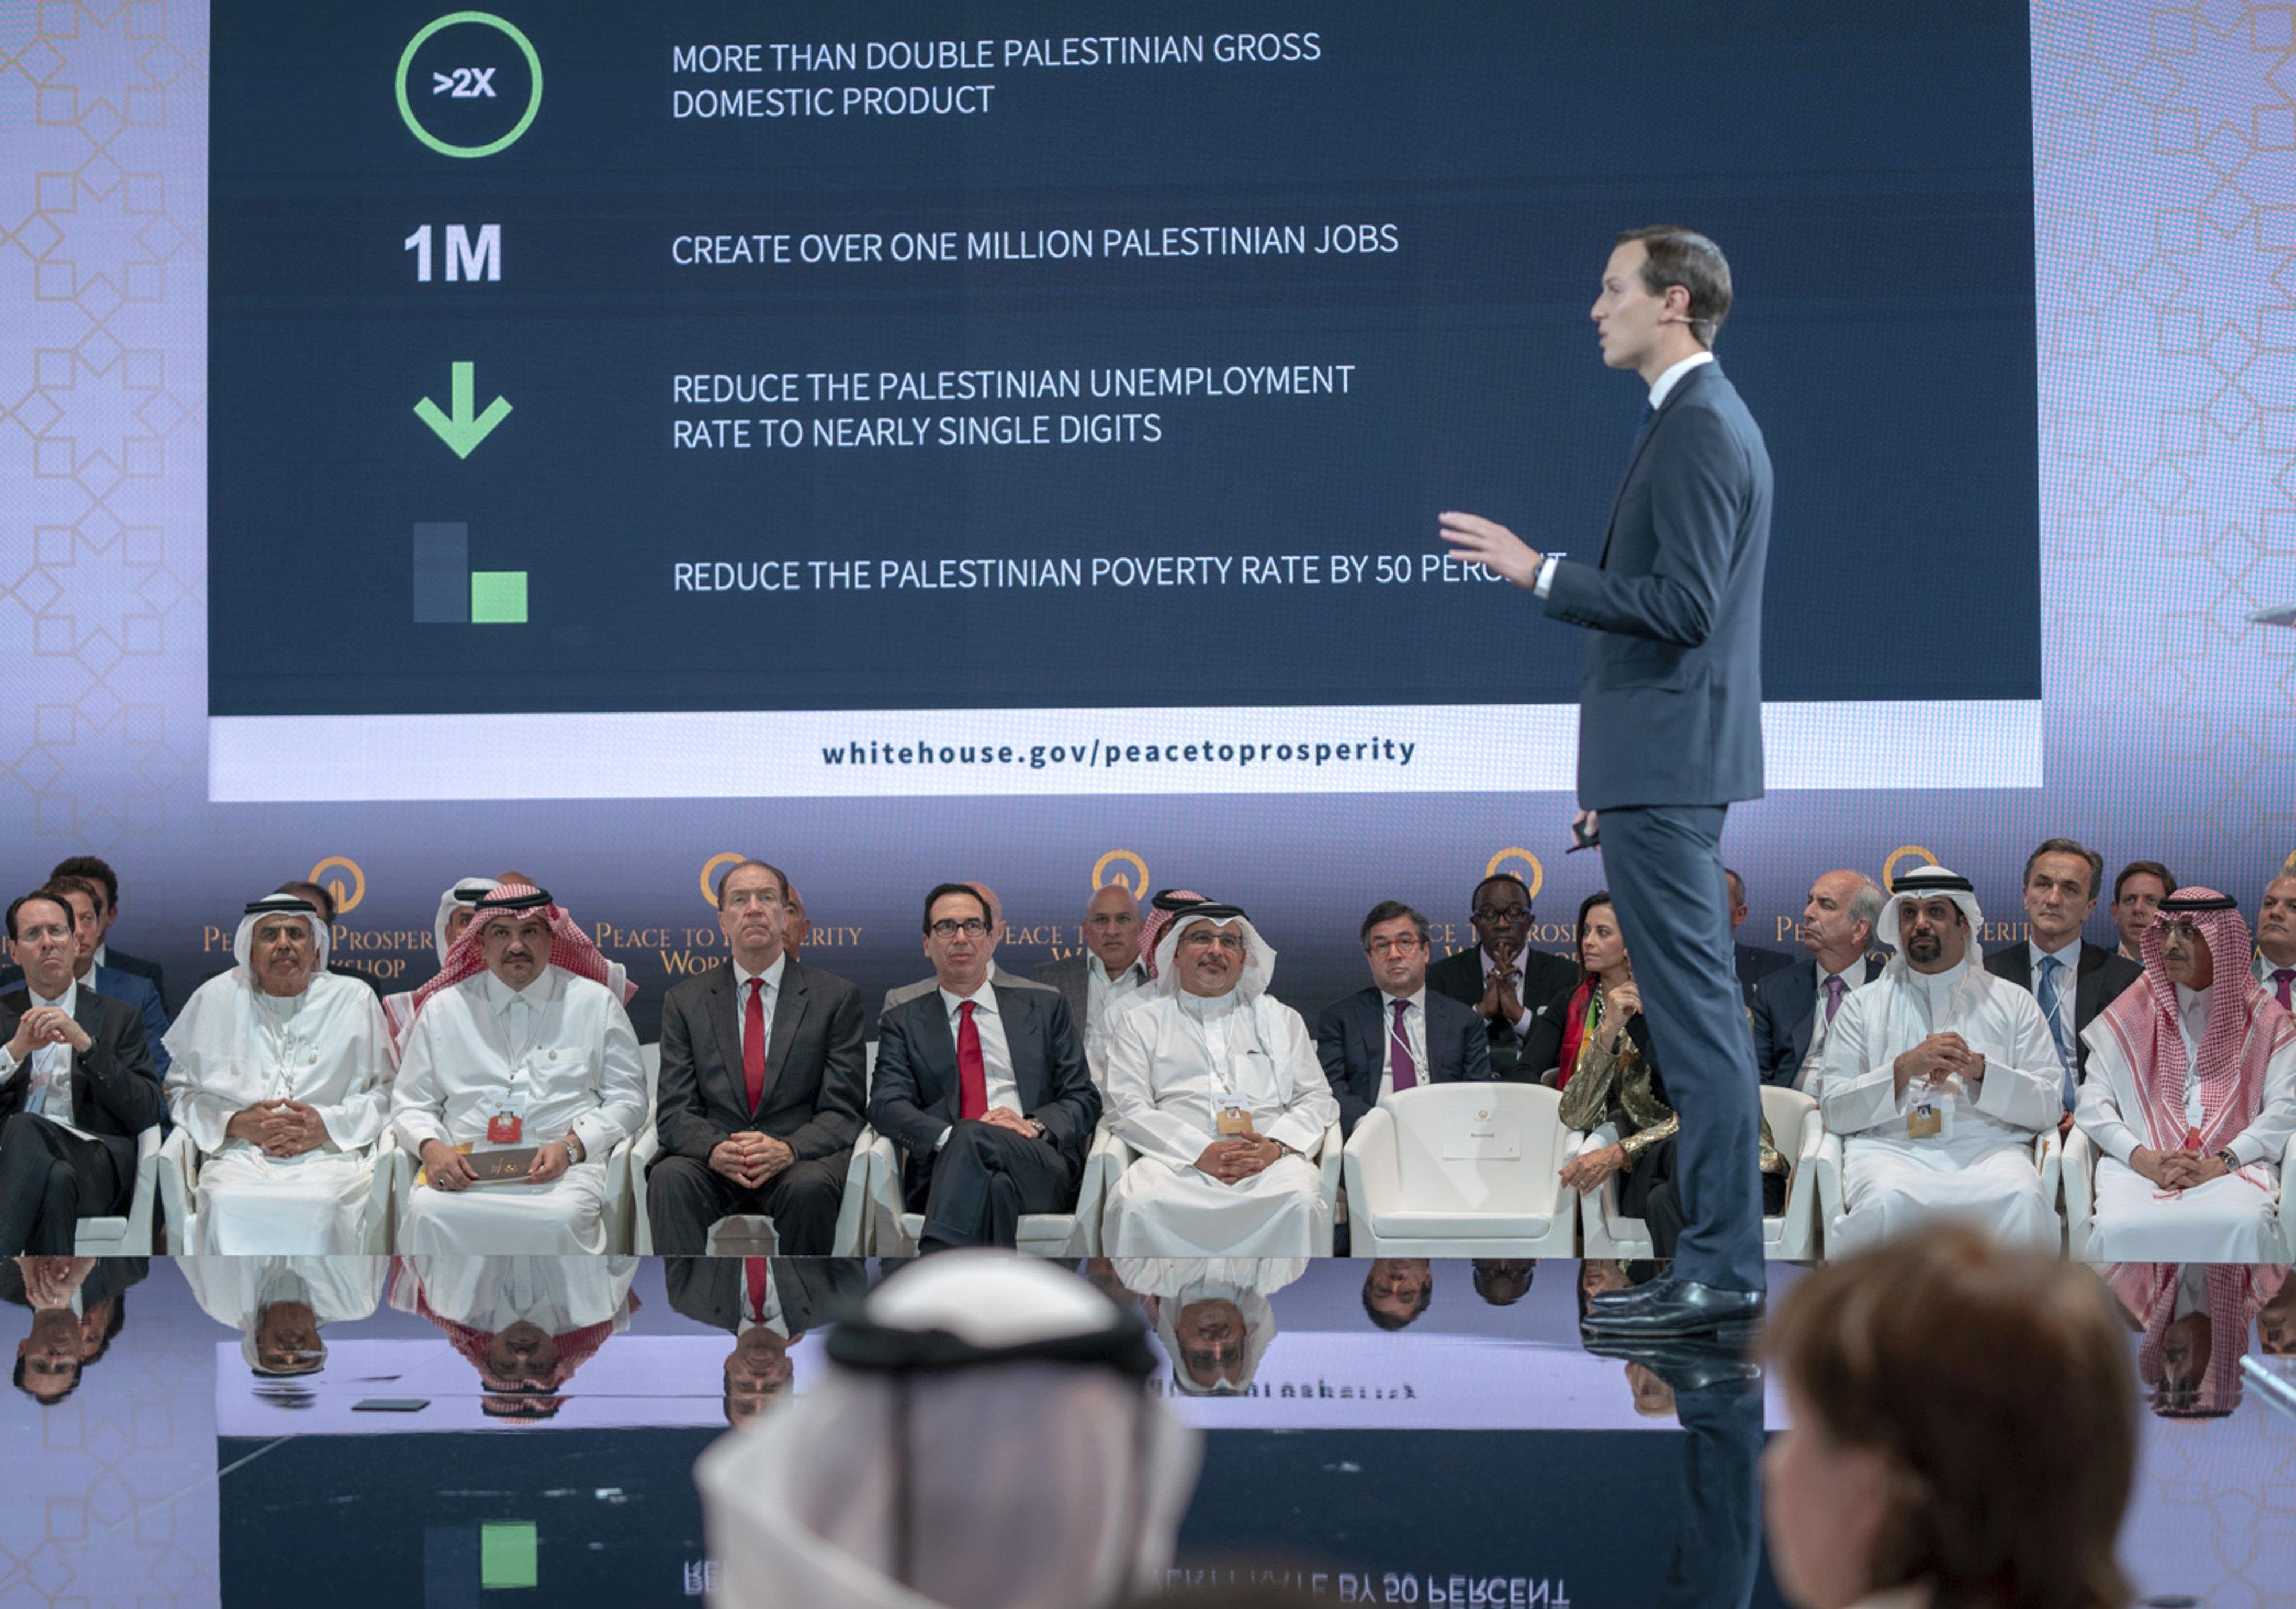 "U.S. Treasury Secretary Steven Mnuchin, fifth from left, and Bahraini Crown Prince Salman bin Hamad al-Khalifa, sixth from left, listen to Jared Kushner, White House senior advisor, standing, during the opening session of the ""Peace to Prosperity"" workshop in Manama, Bahrain, June 25. (Bahrain News Agency via AP)"